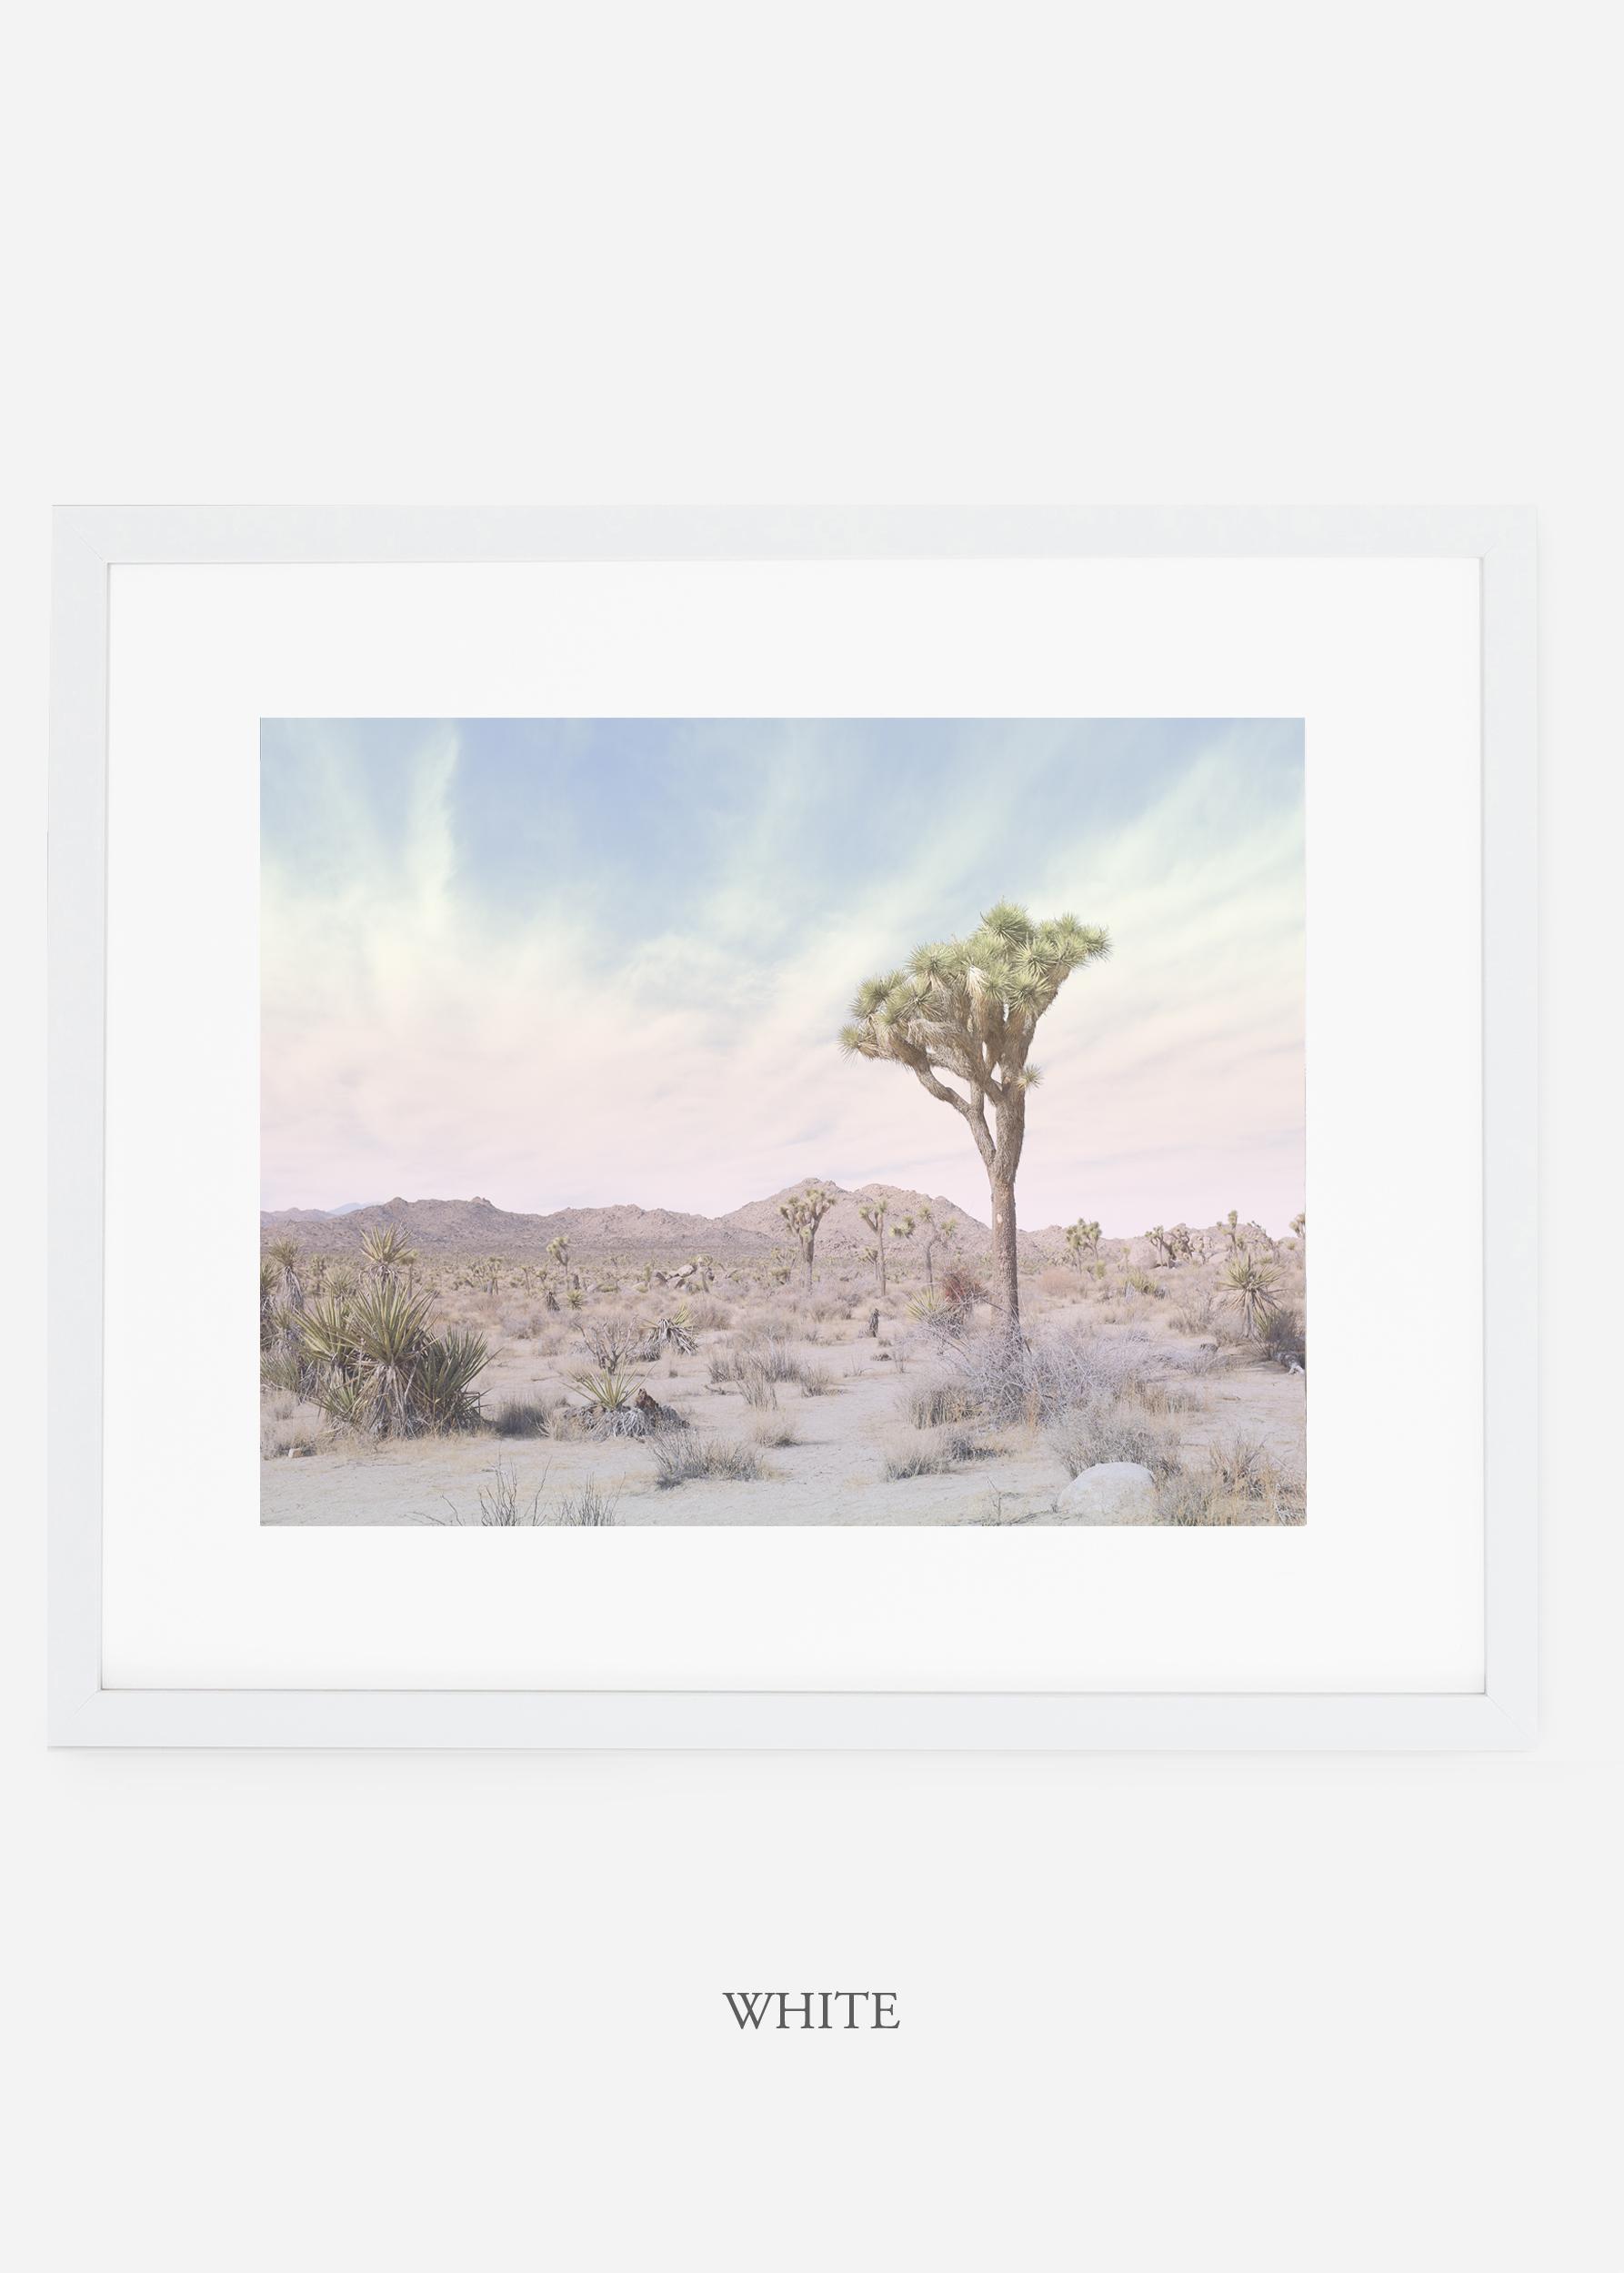 WilderCalifornia_whiteframe_JoshuaTree_No.13_interiordesign_prints_art.jpg